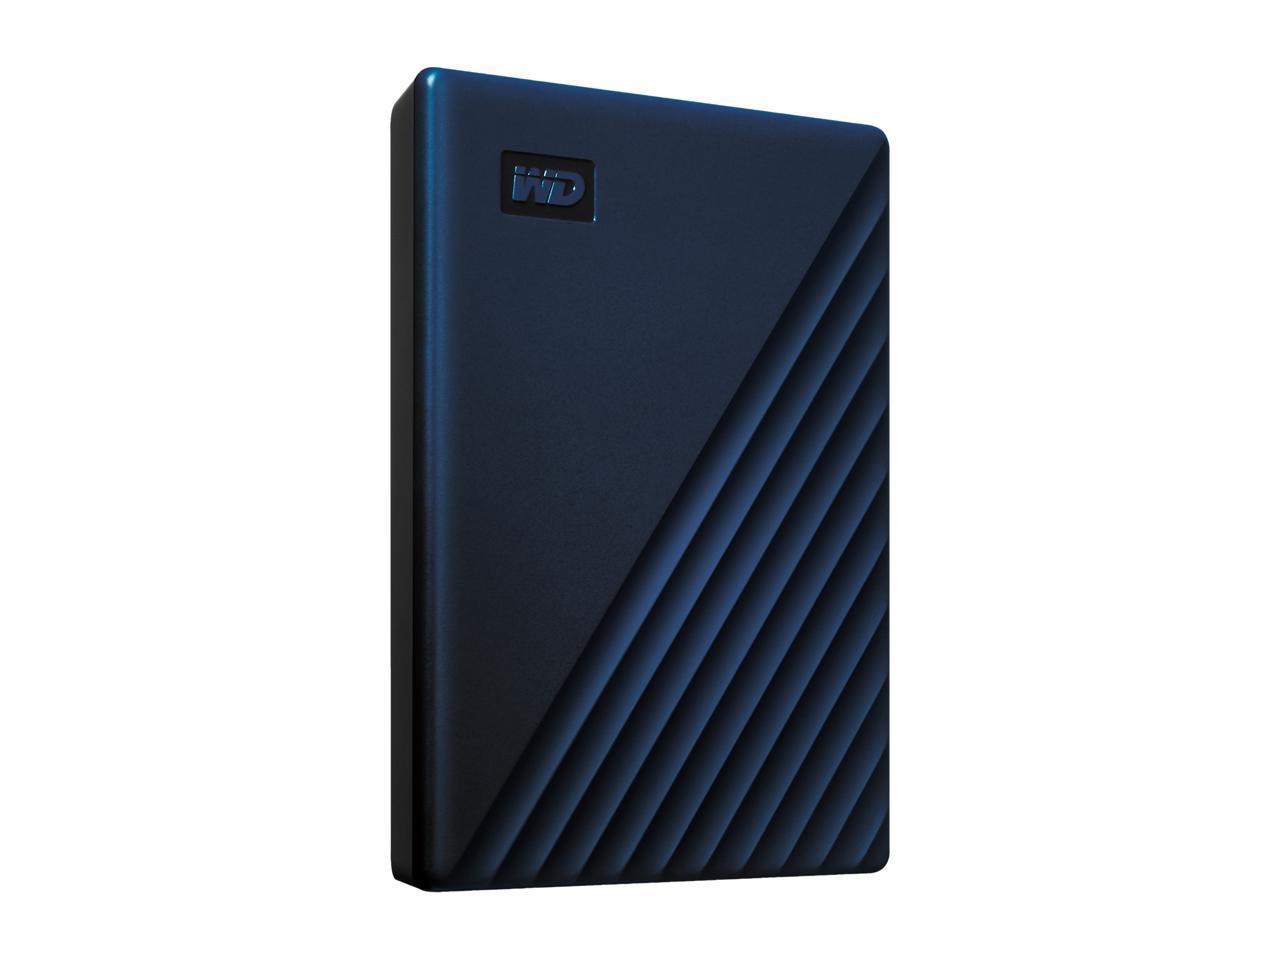 "Външен хард диск Western Digital My Passport, 2TB, 2.5"", USB 3.0"